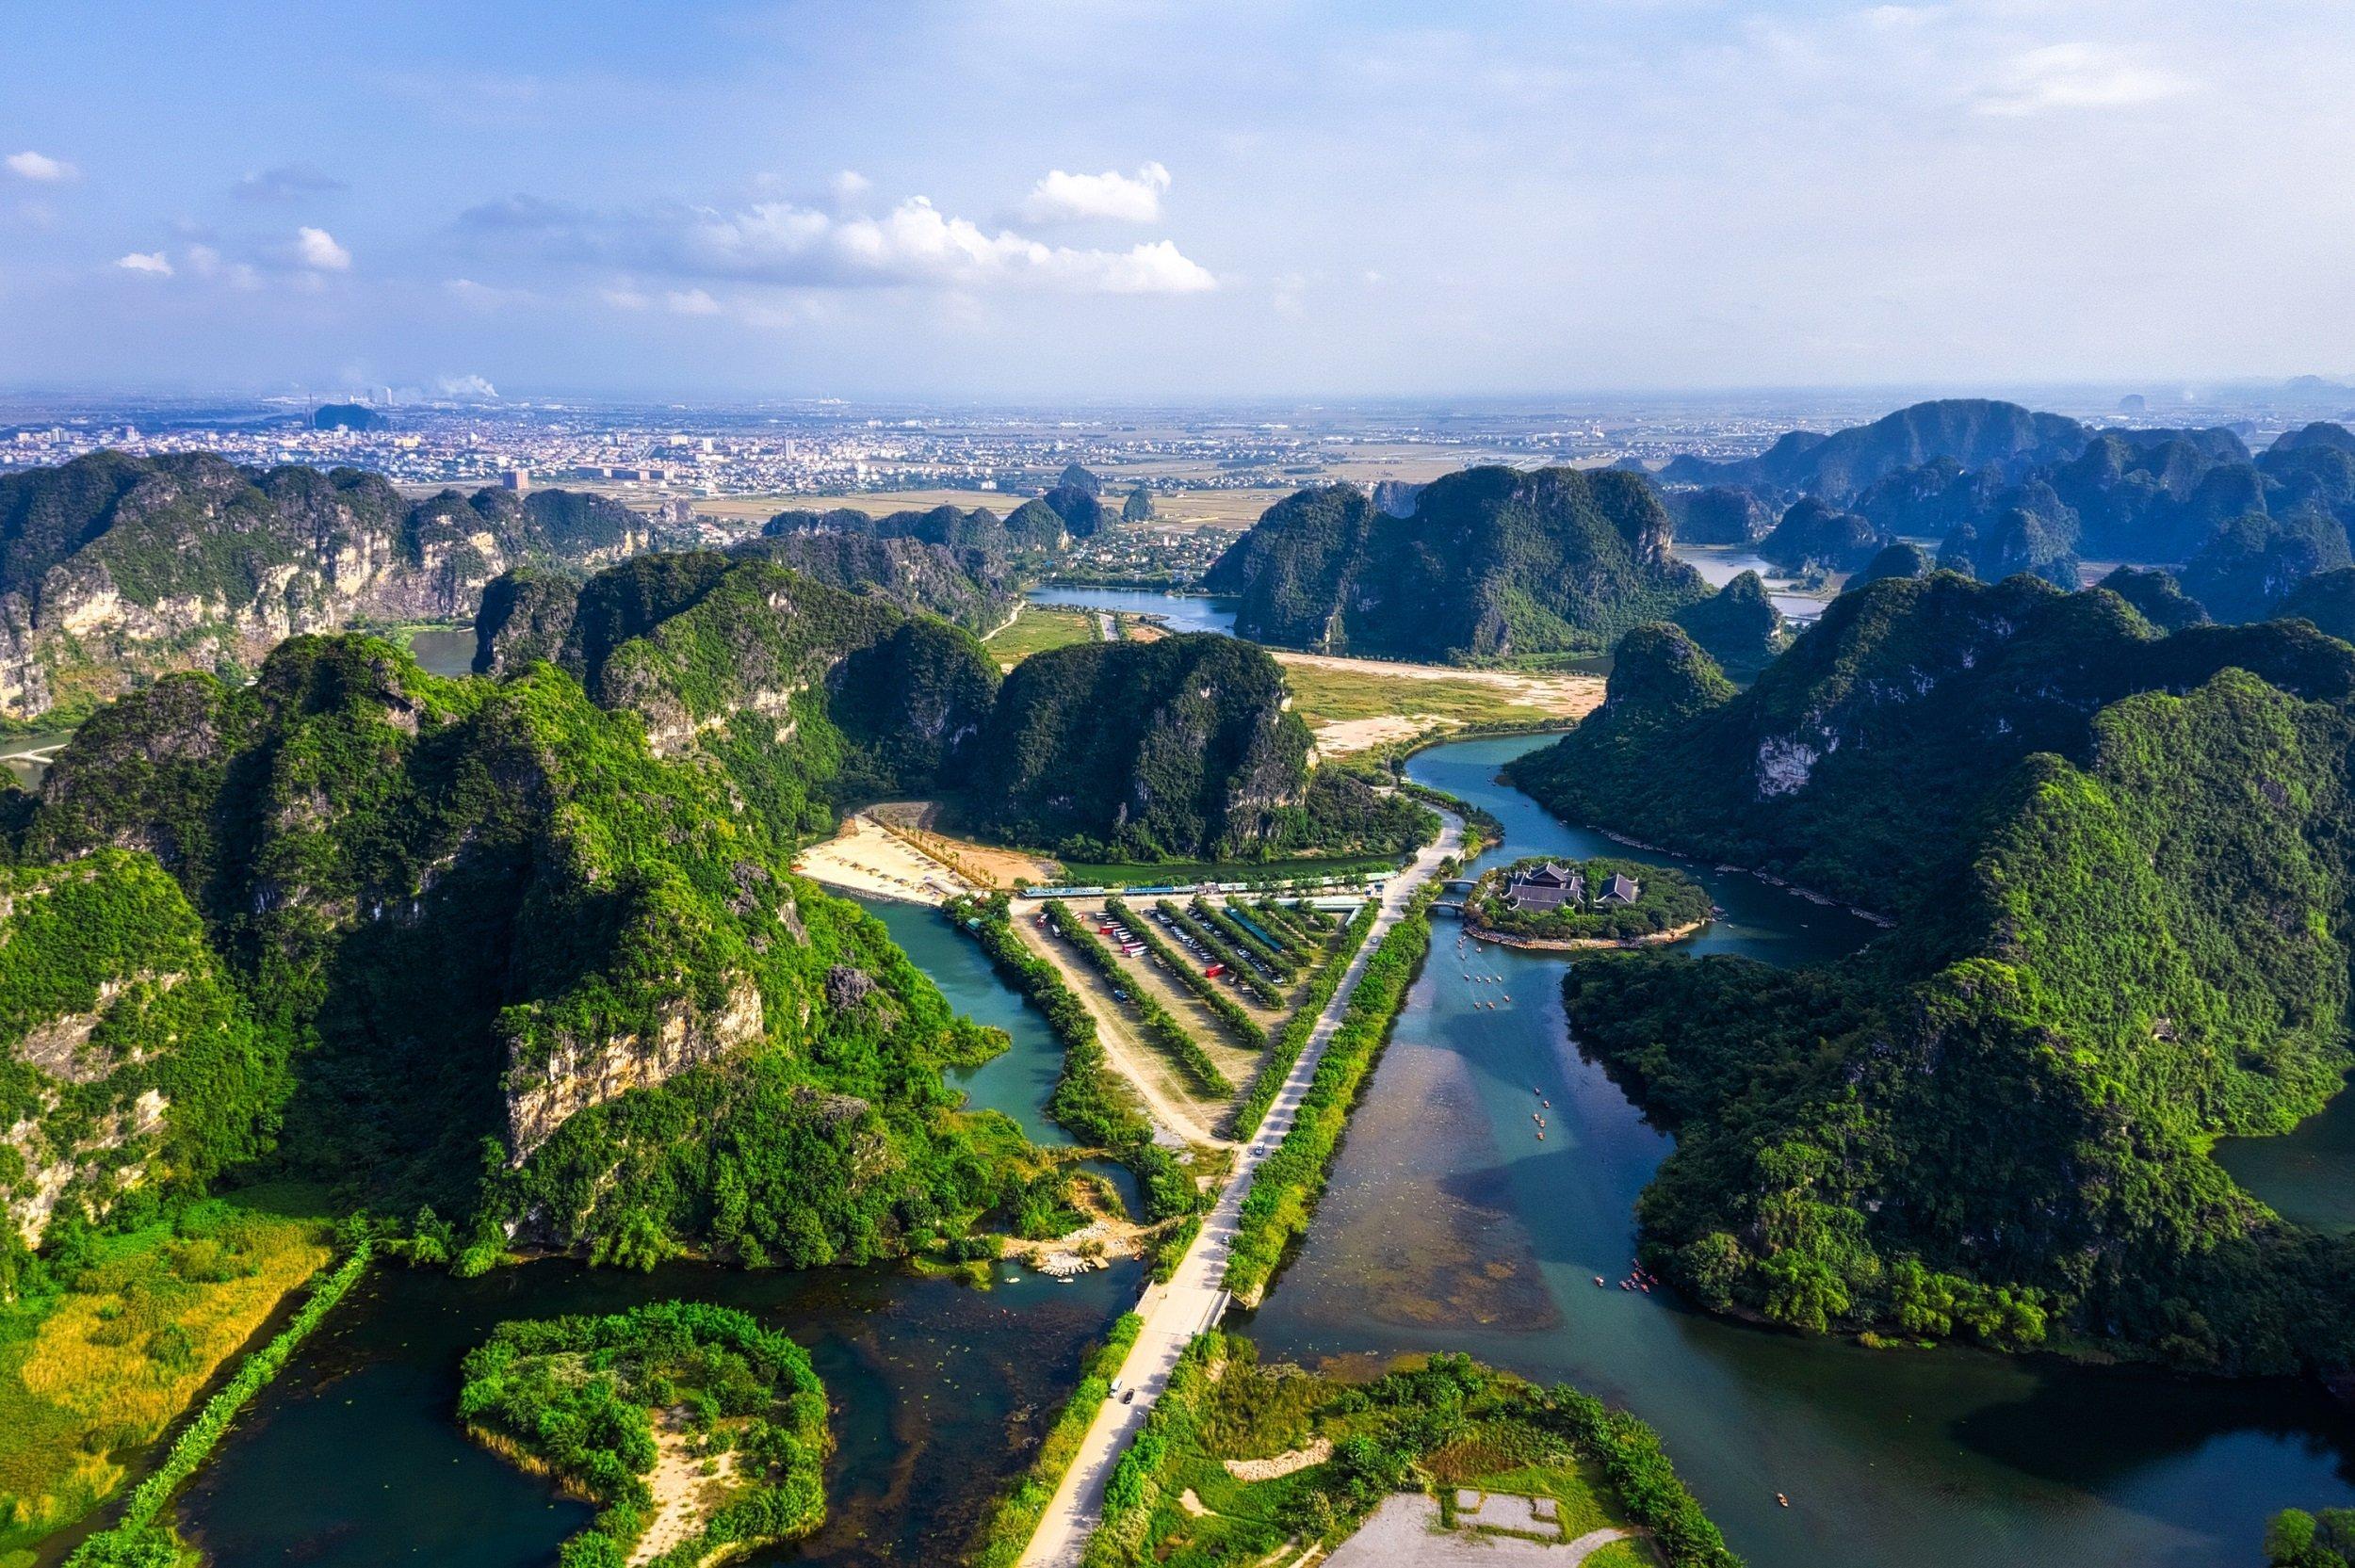 Discover The Beautiful Province Of Ninh Binh On The Ninh Binh, Tam Coc, Dancing Cave & Hoa Lu Tour From Hanoi